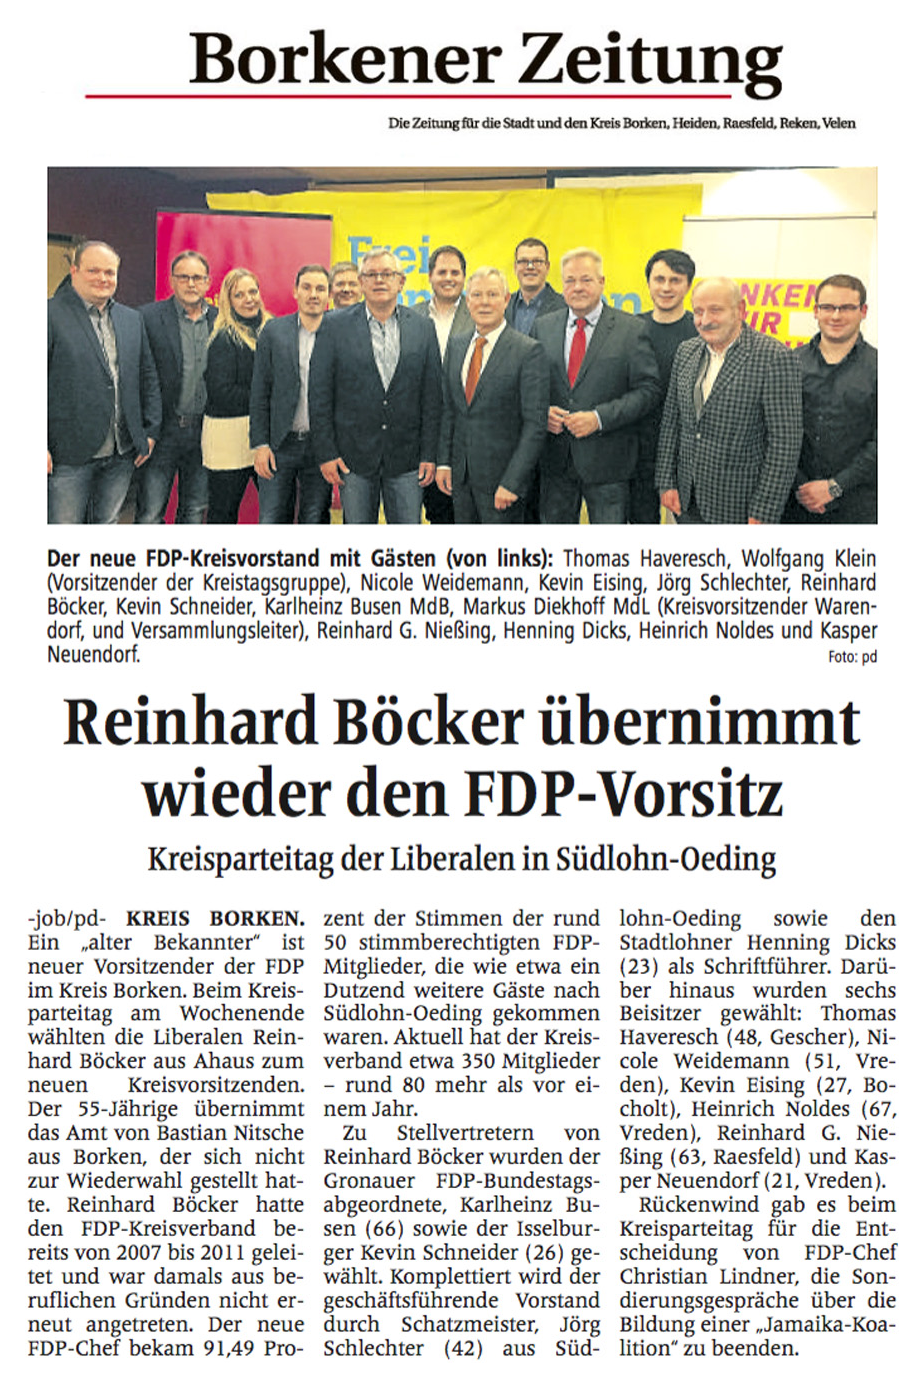 Böcker übernimmt FDP-Kreisvorsitz